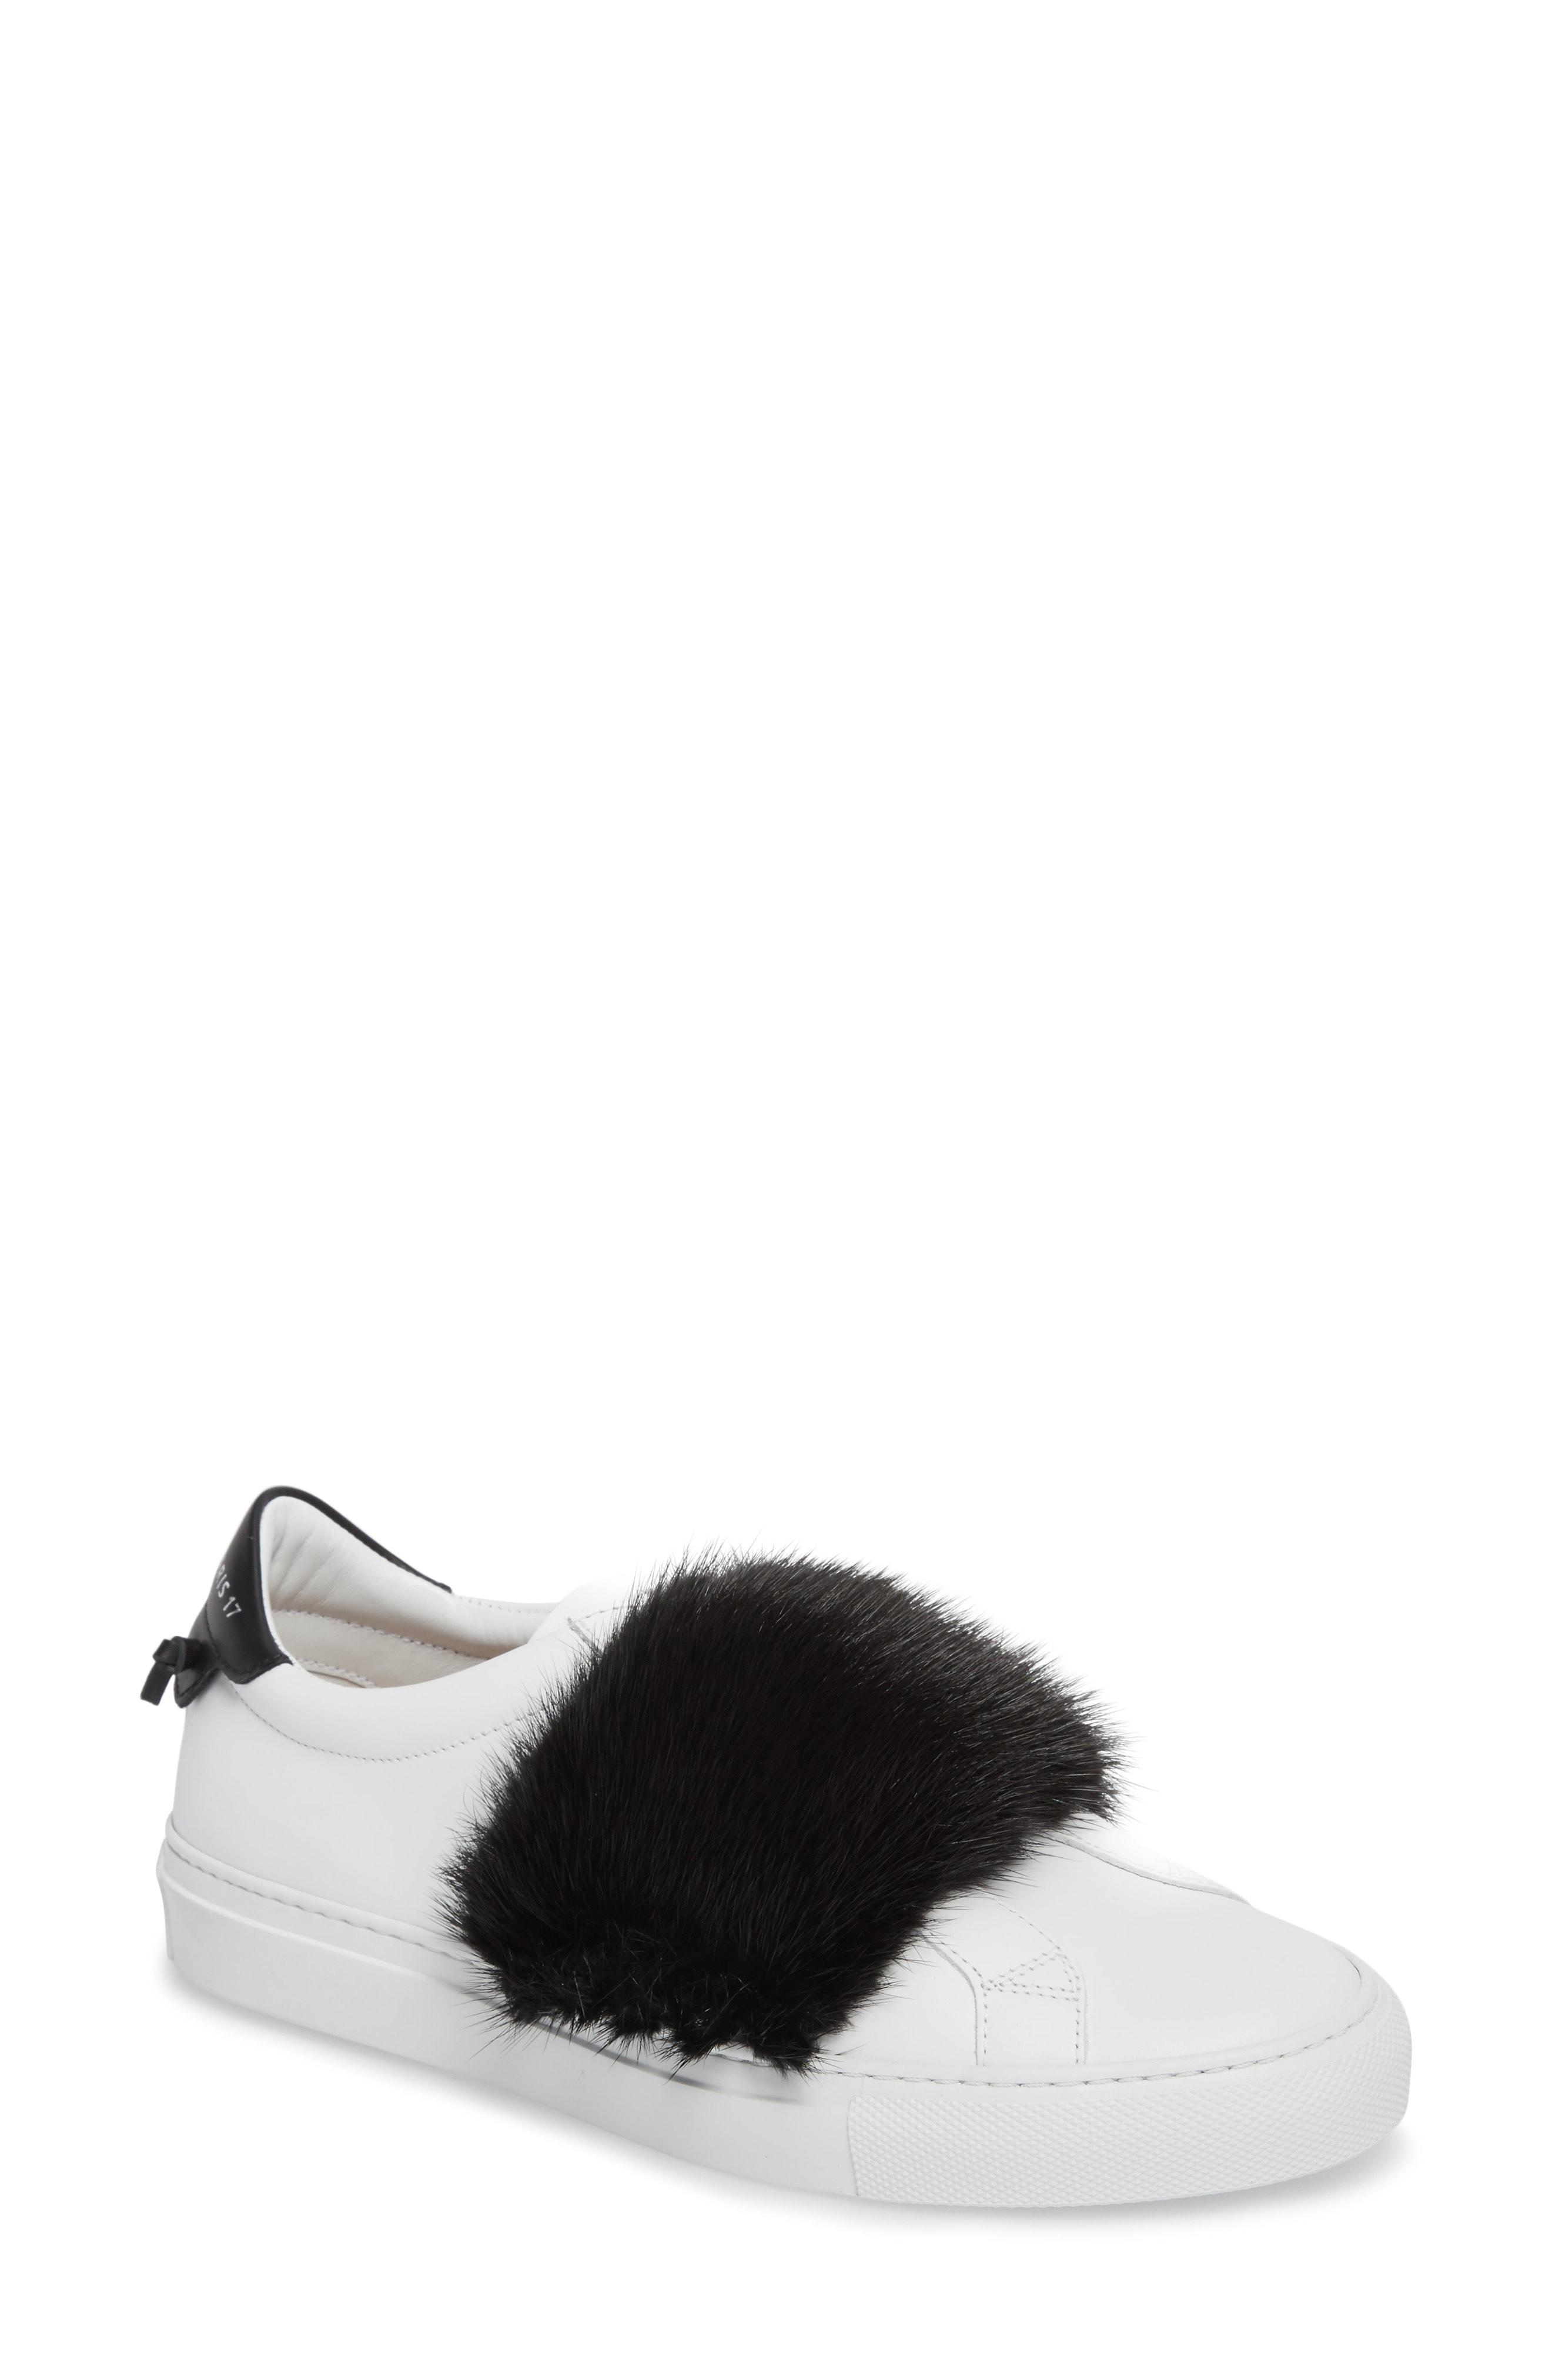 f6e4397ac0c4 Givenchy Urban Street Slip-On Sneaker With Genuine Mink Fur Trim In Black   White